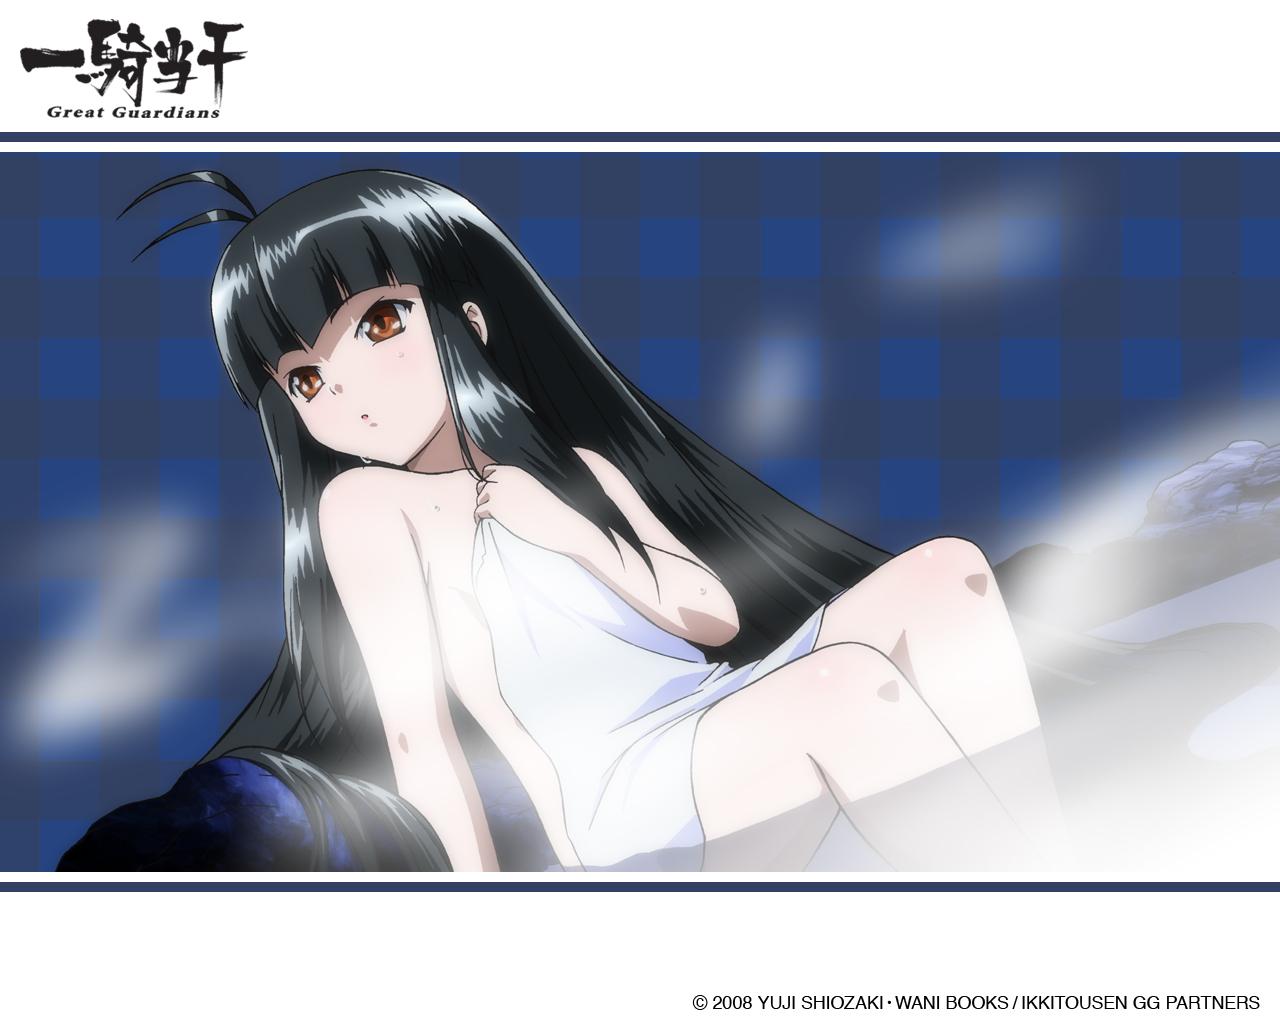 black_hair choushou_shifu flat_chest ikkitousen ikkitousen~great_guardians~ long_hair nude onsen orange_eyes tagme_(artist) towel